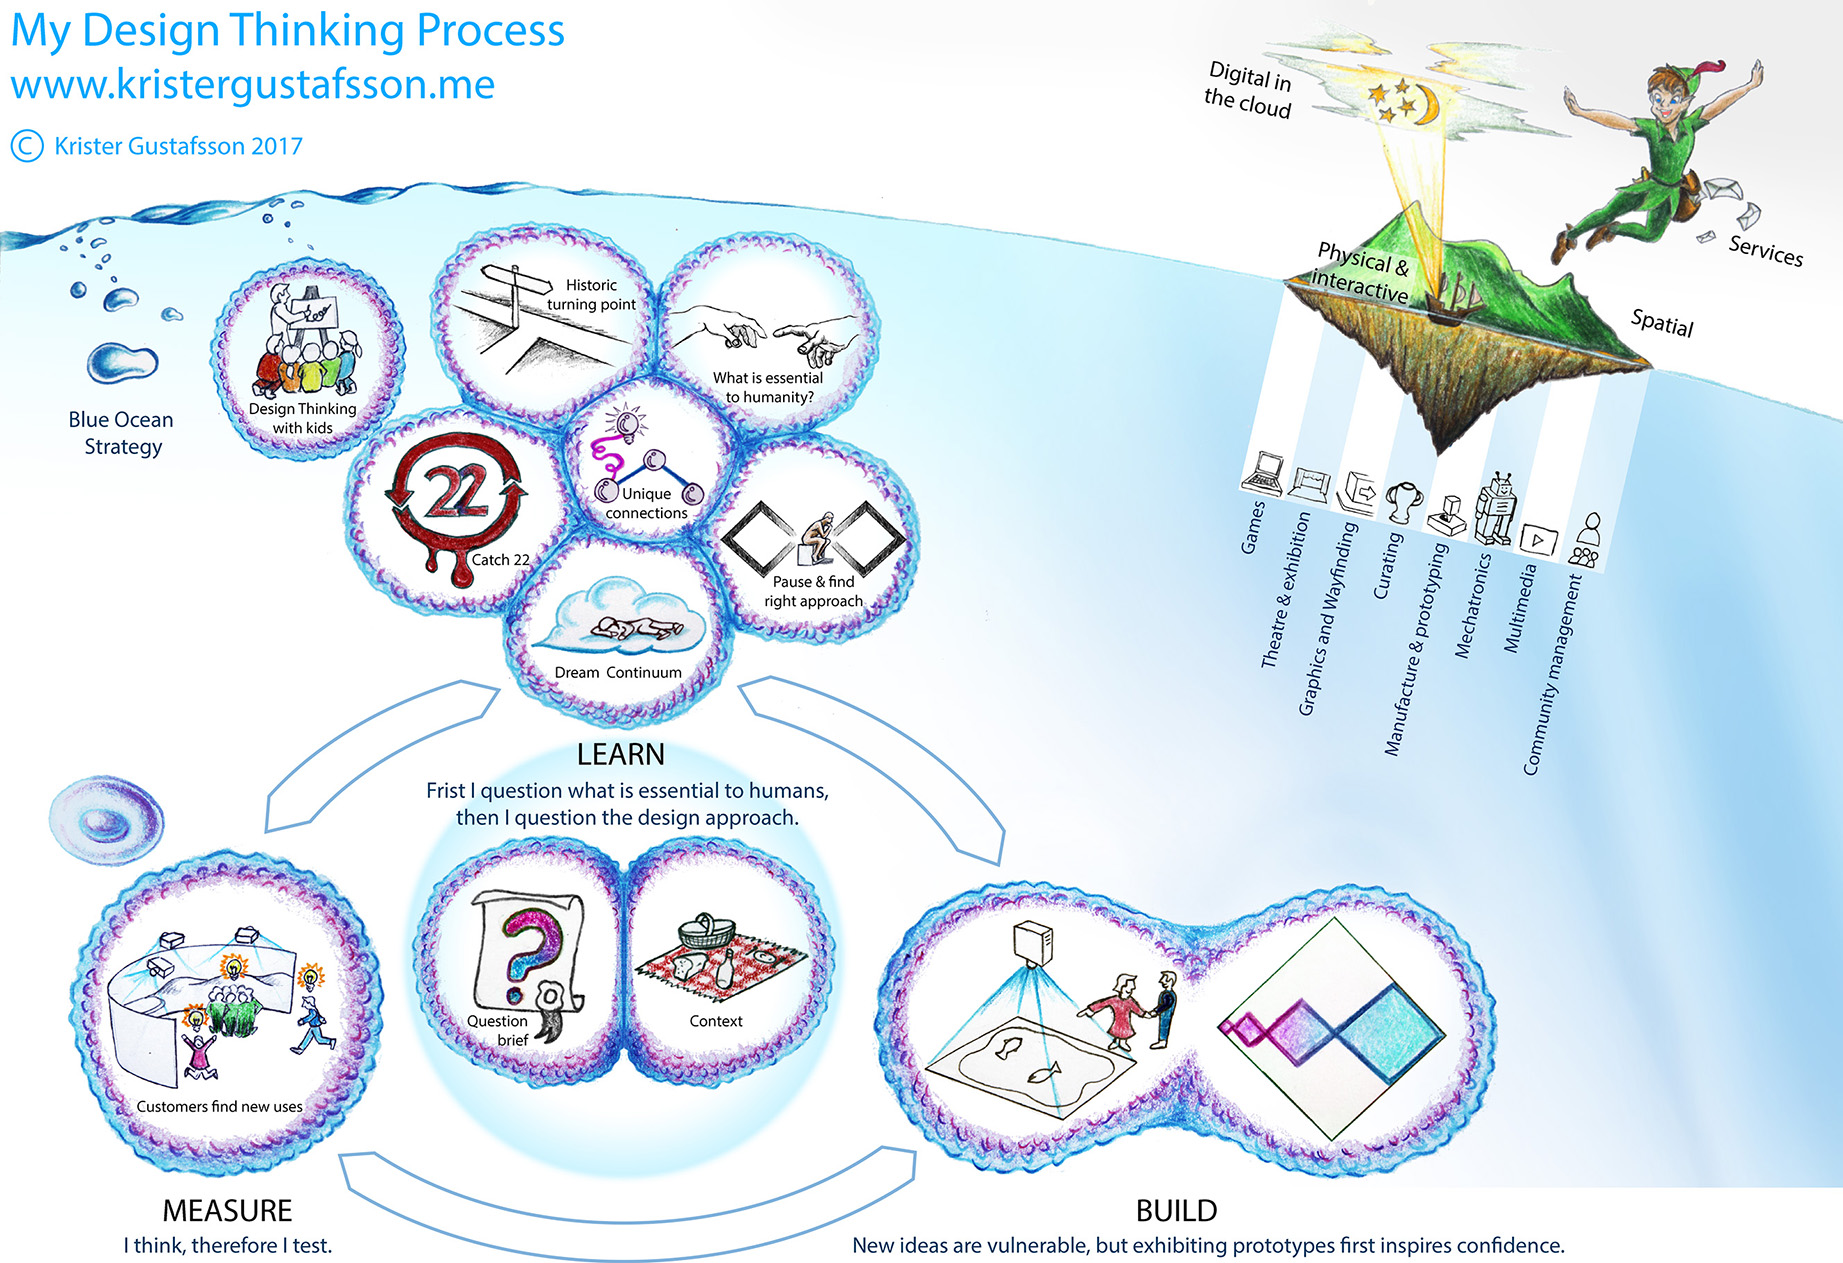 Krister Gustafsson Design Thinking Process 23 Jan 2018.jpg